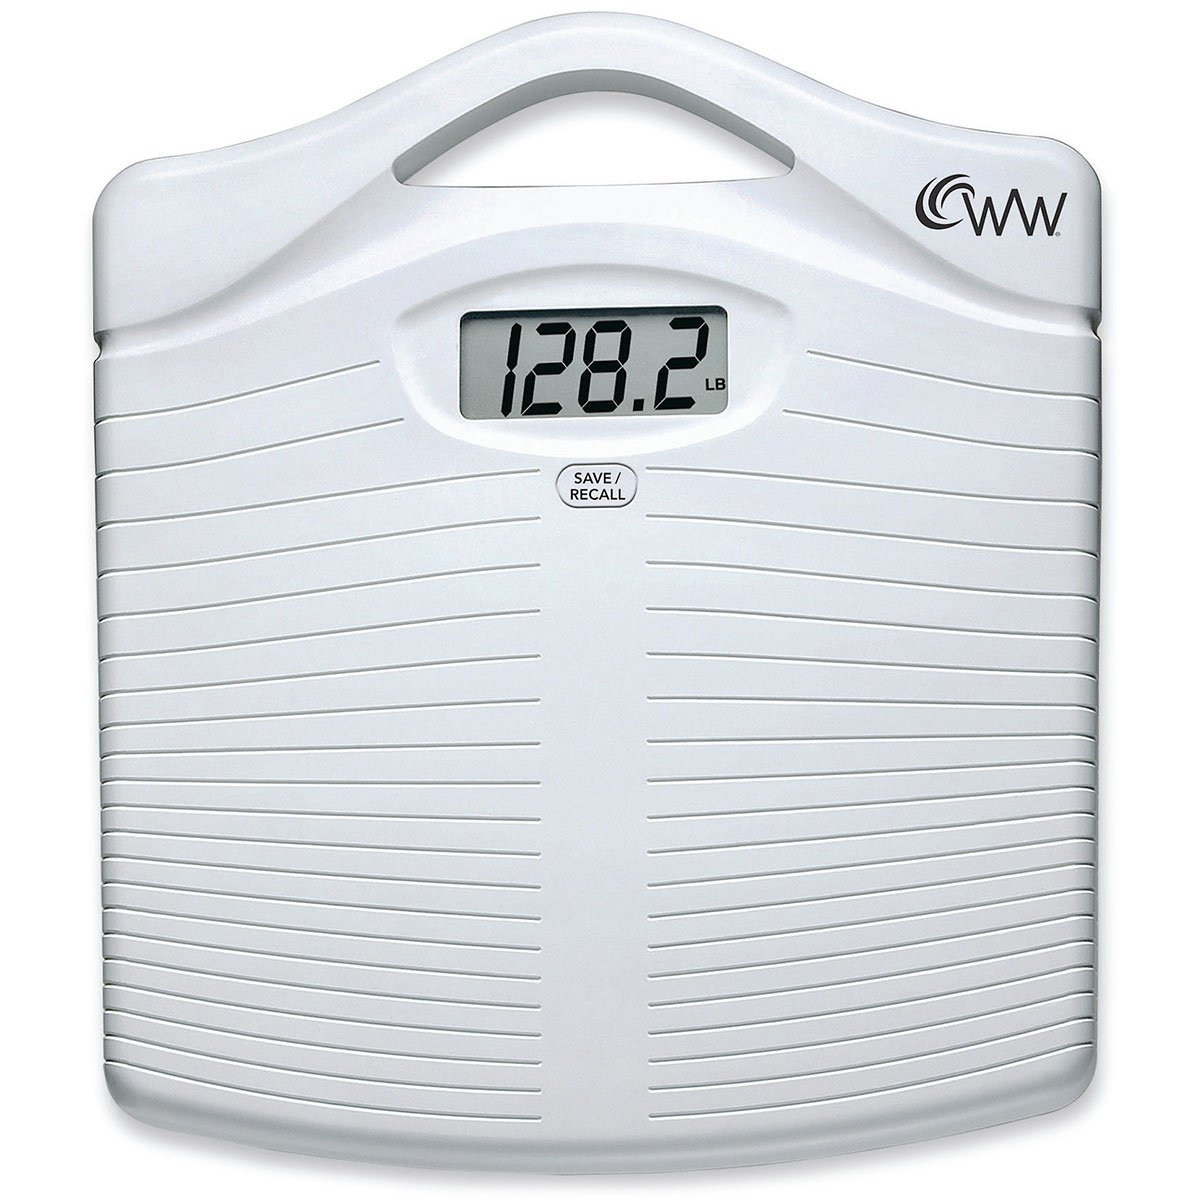 Amazon.com: CONAIR CORPORATION WW Precision Electric Scale: Health U0026  Personal Care